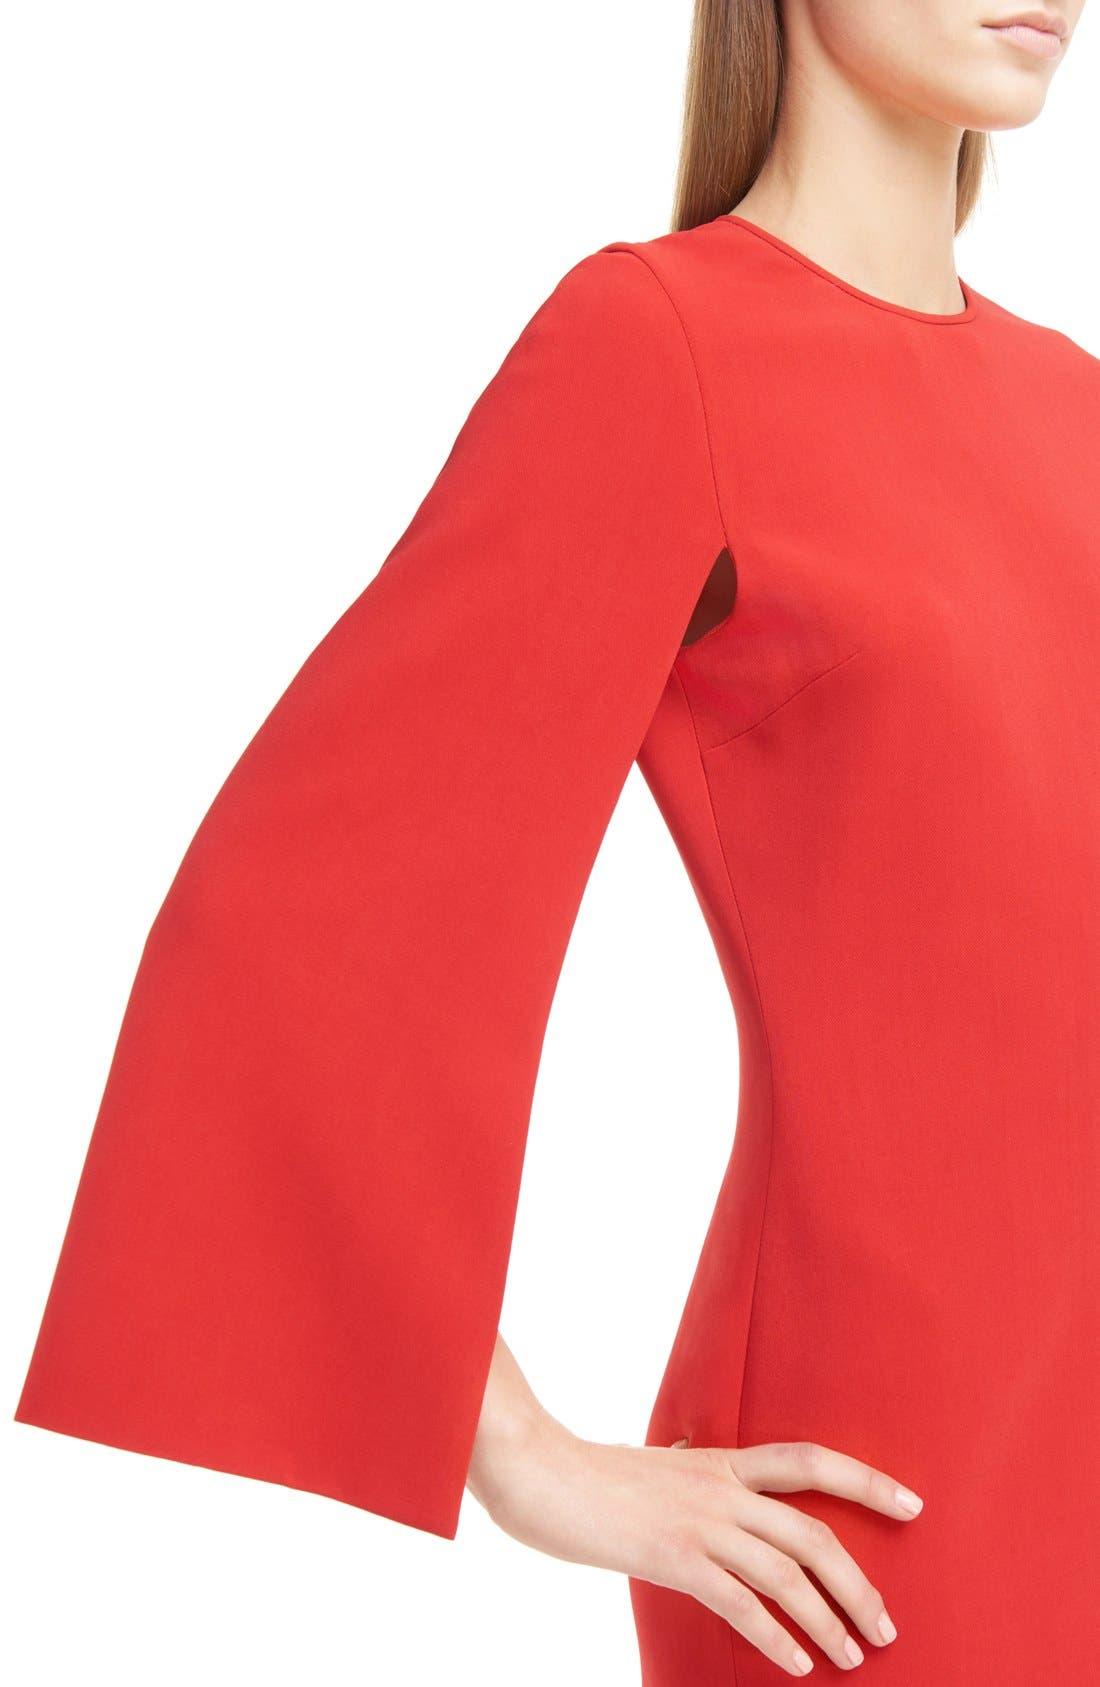 GIVENCHY,                             Cape Sleeve Dress,                             Alternate thumbnail 6, color,                             600